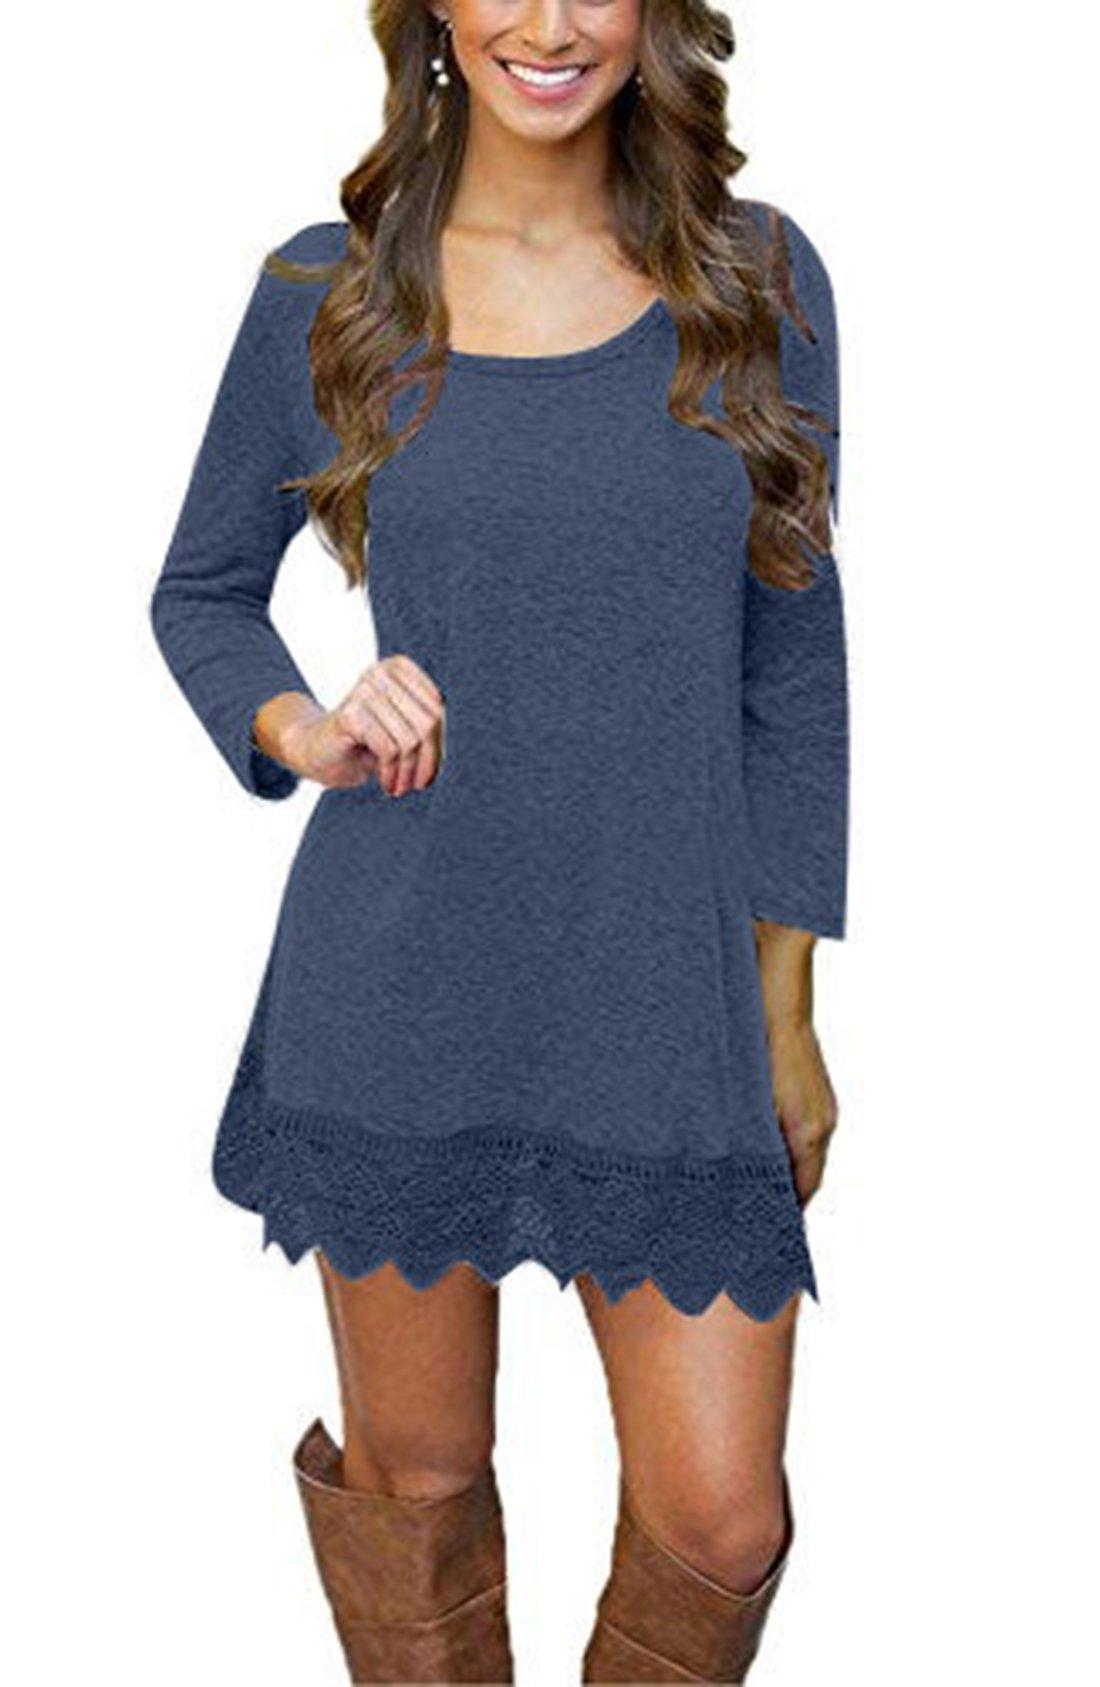 Our Precious Women's Casual Long Sleeve Lace Hem A-Line Shirt Dress Tunic Tops Navy XL